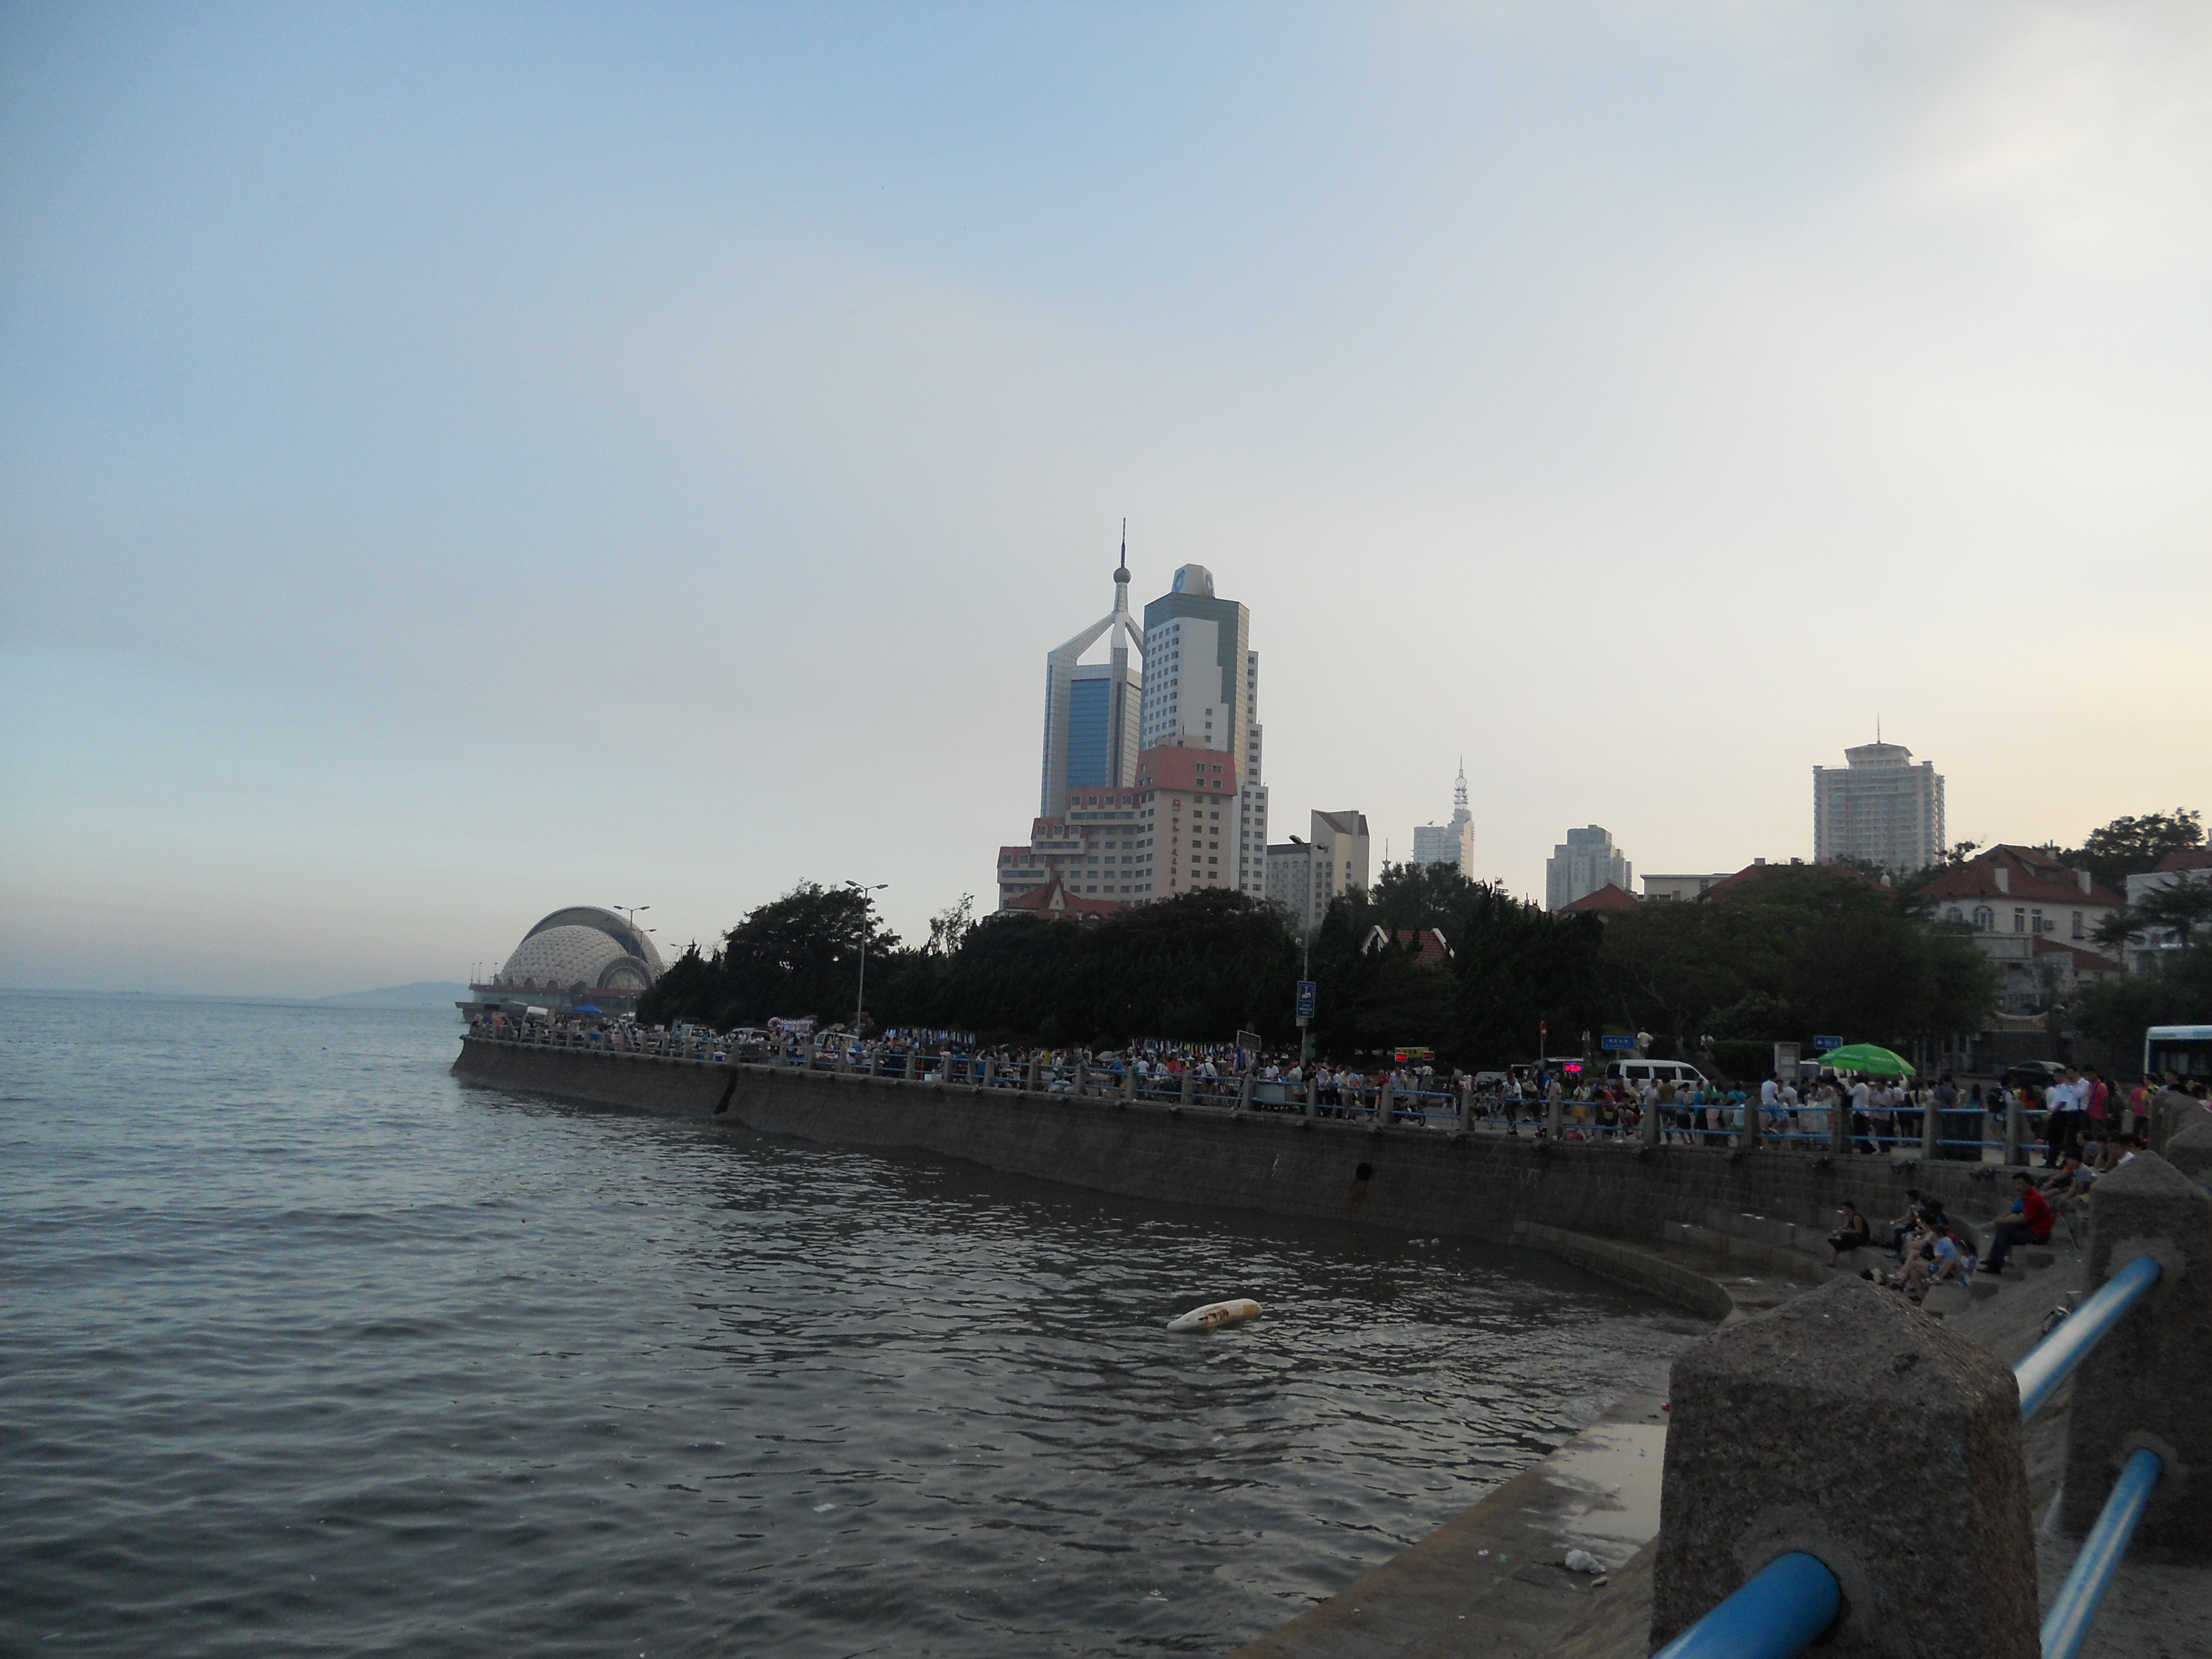 Qingdao Old Town Tuandao